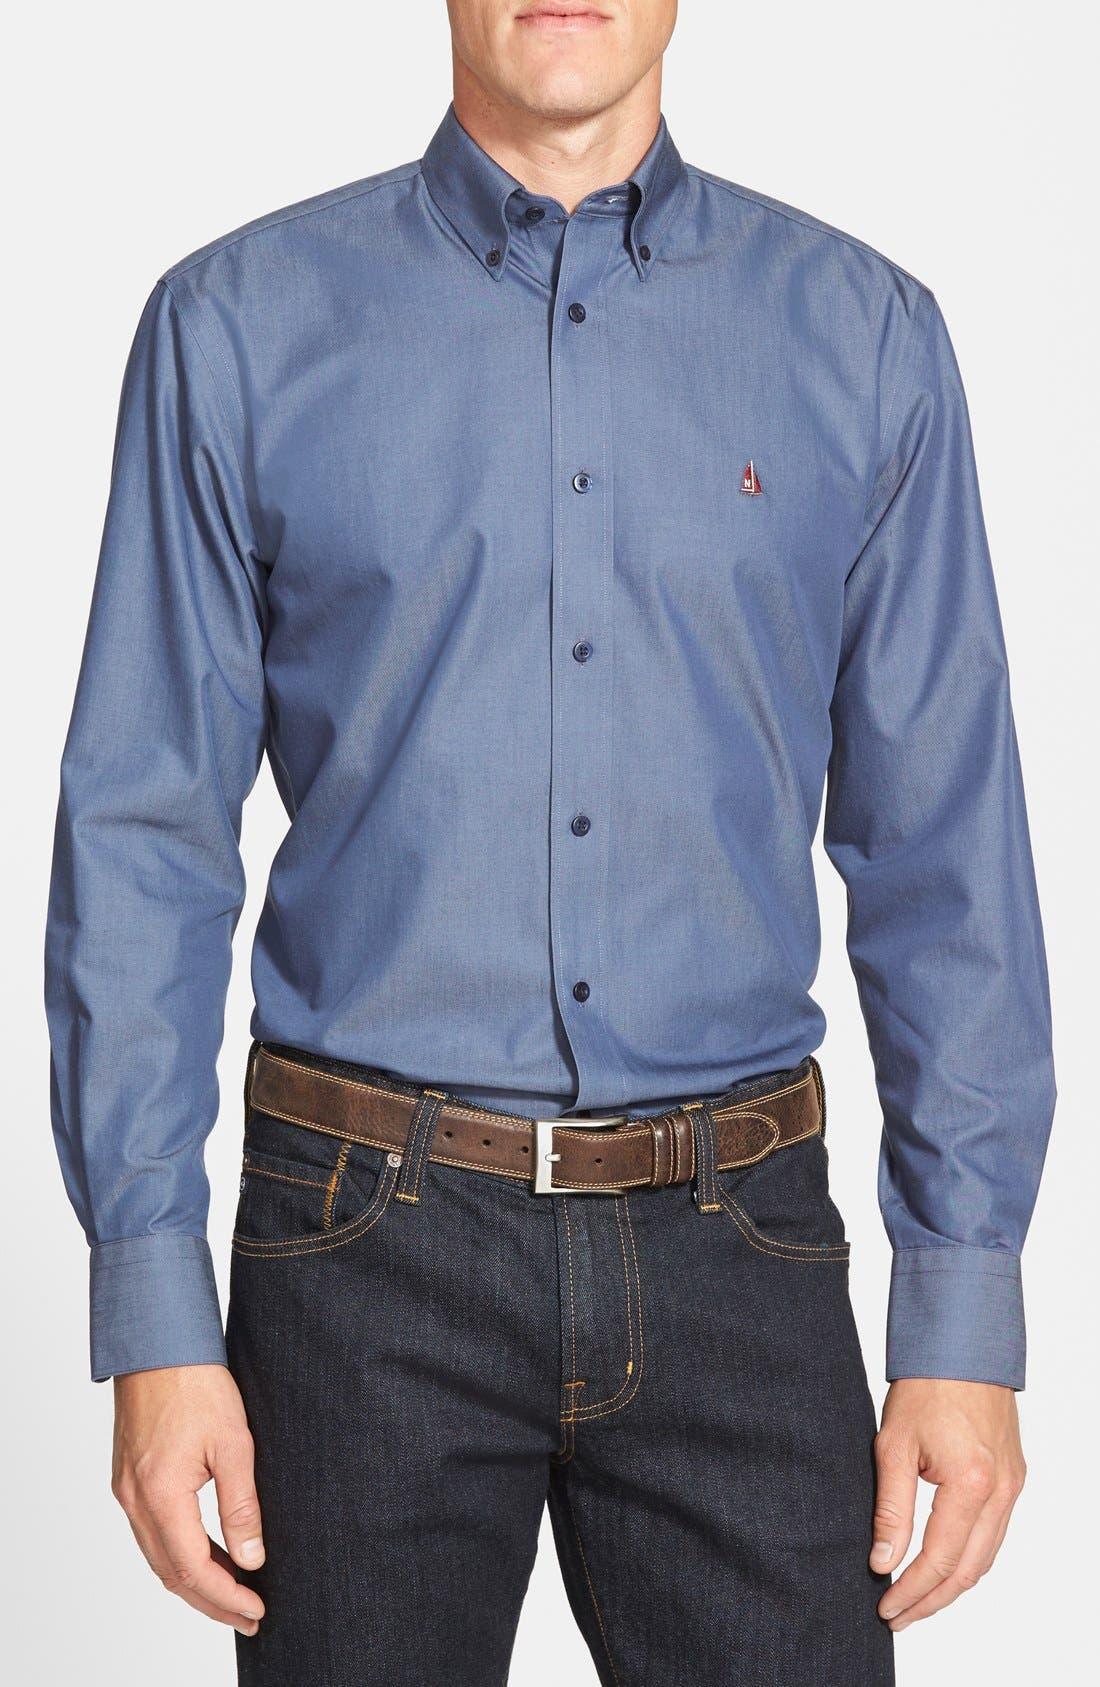 Main Image - Nordstrom Men's Shop Smartcare™ Regular Fit Twill Denim Boat Shirt (Regular & Tall)